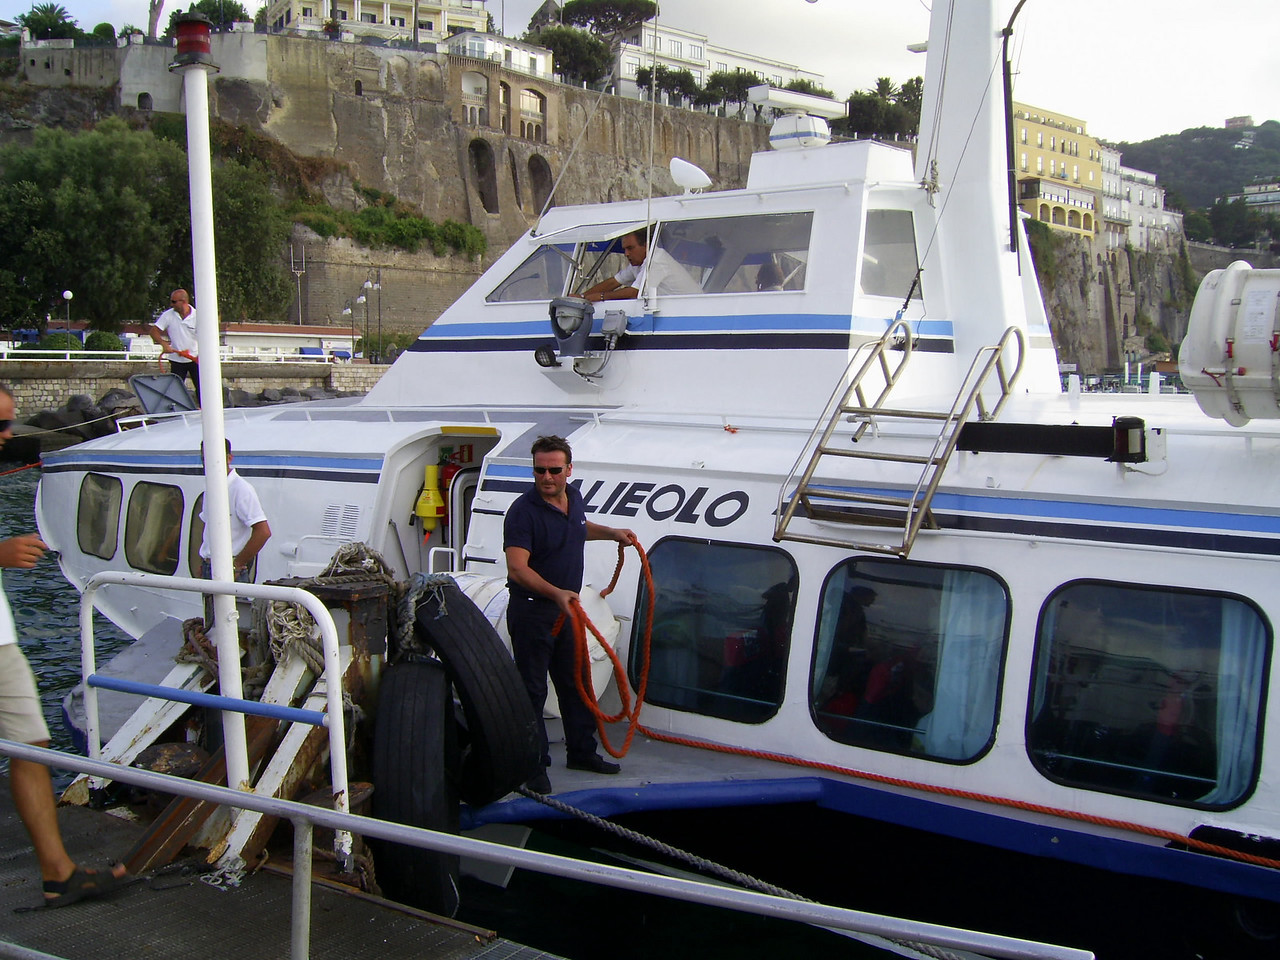 Hydrofoil ALIEOLO mooring in Sorrento.